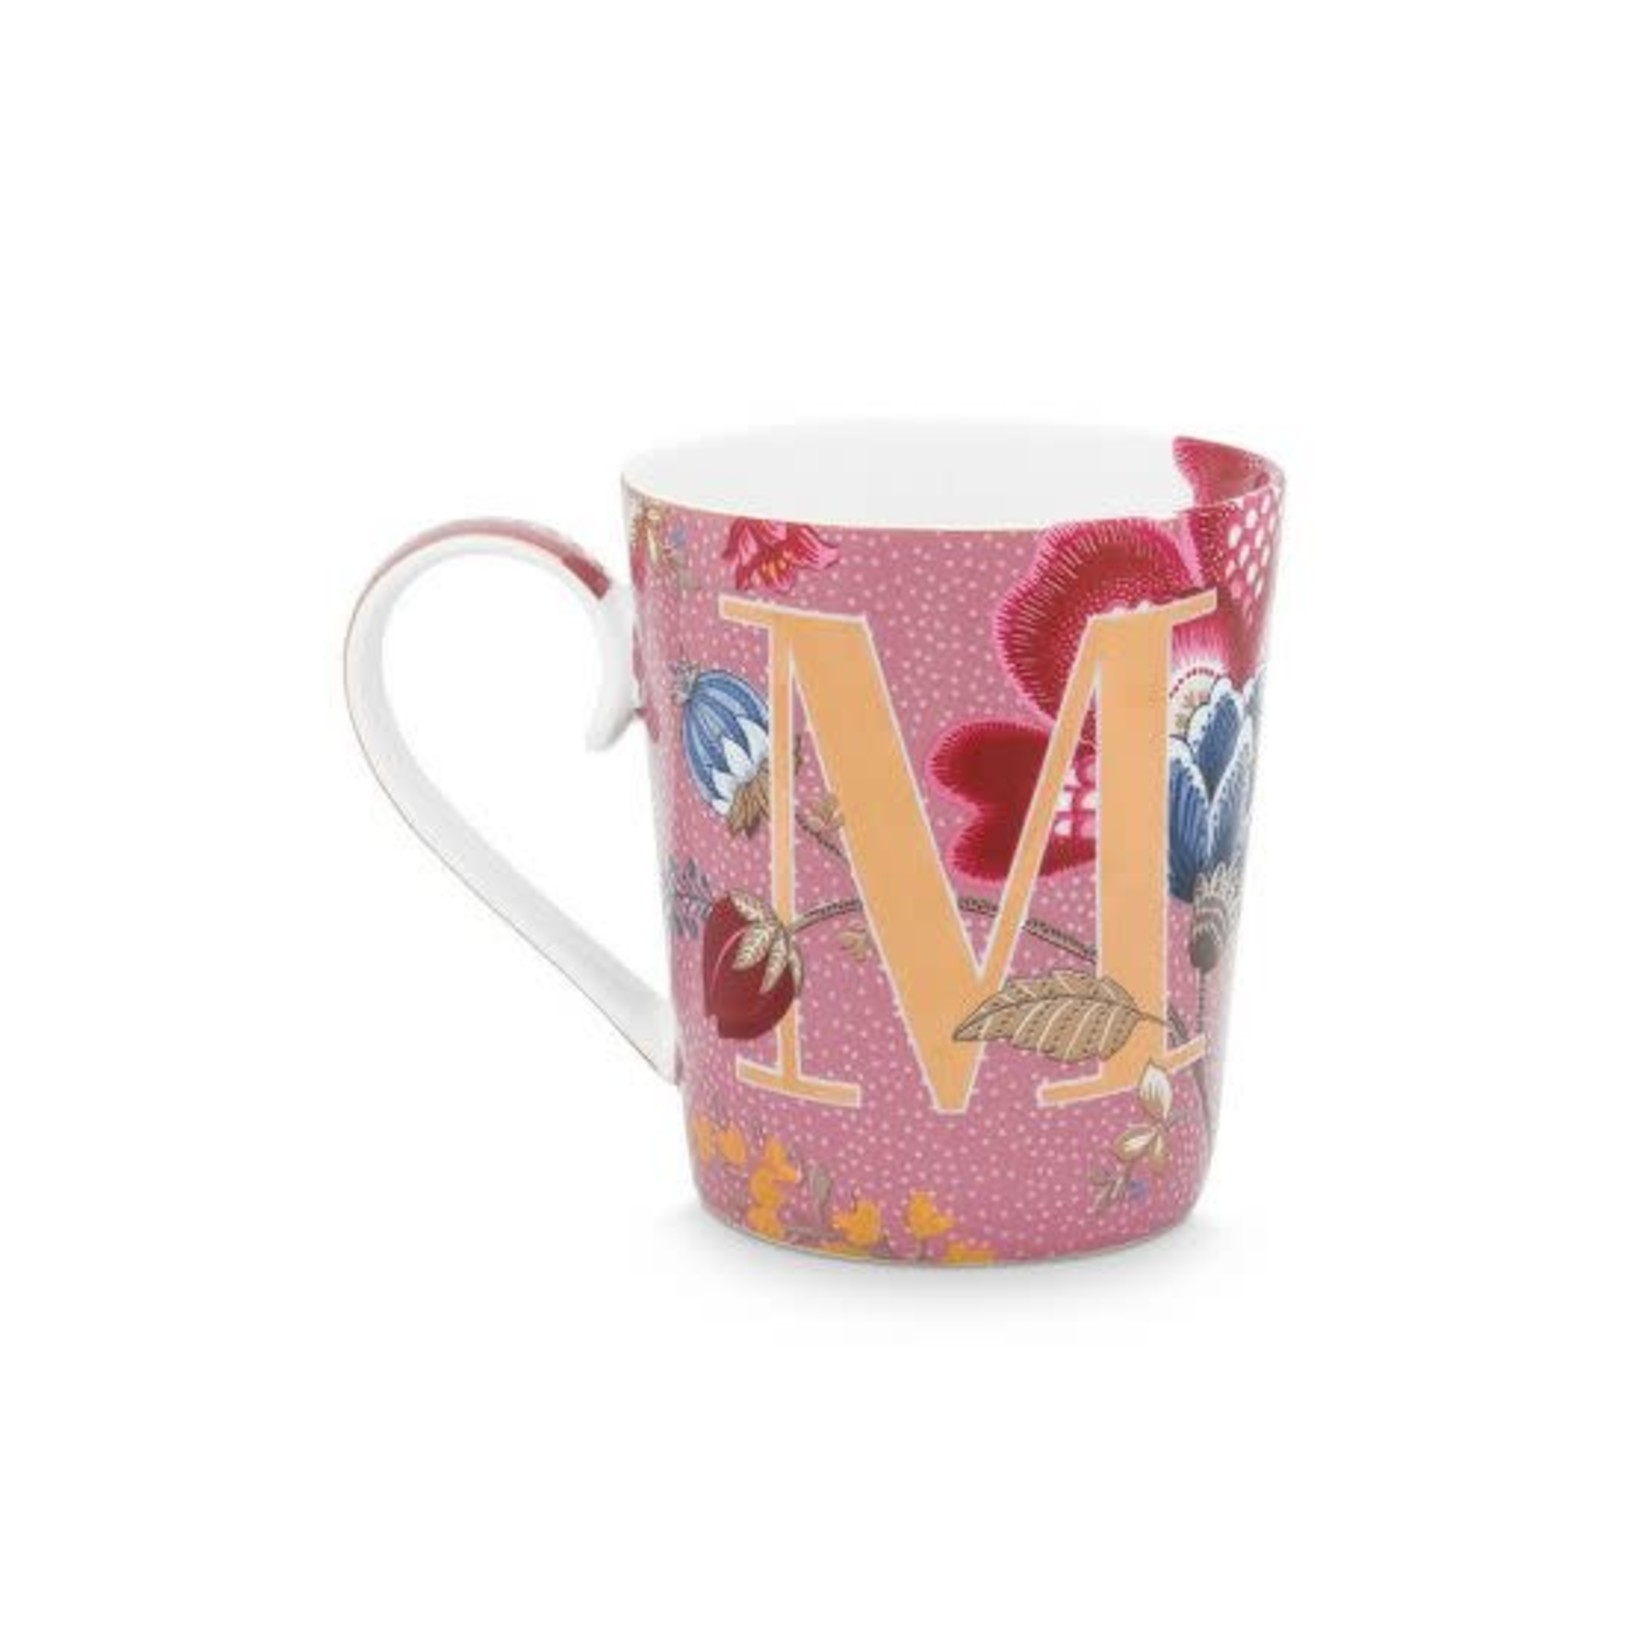 Pip Studio Alphabet Mugs Alphabet Mug Floral Fantasy Pink M 350ml